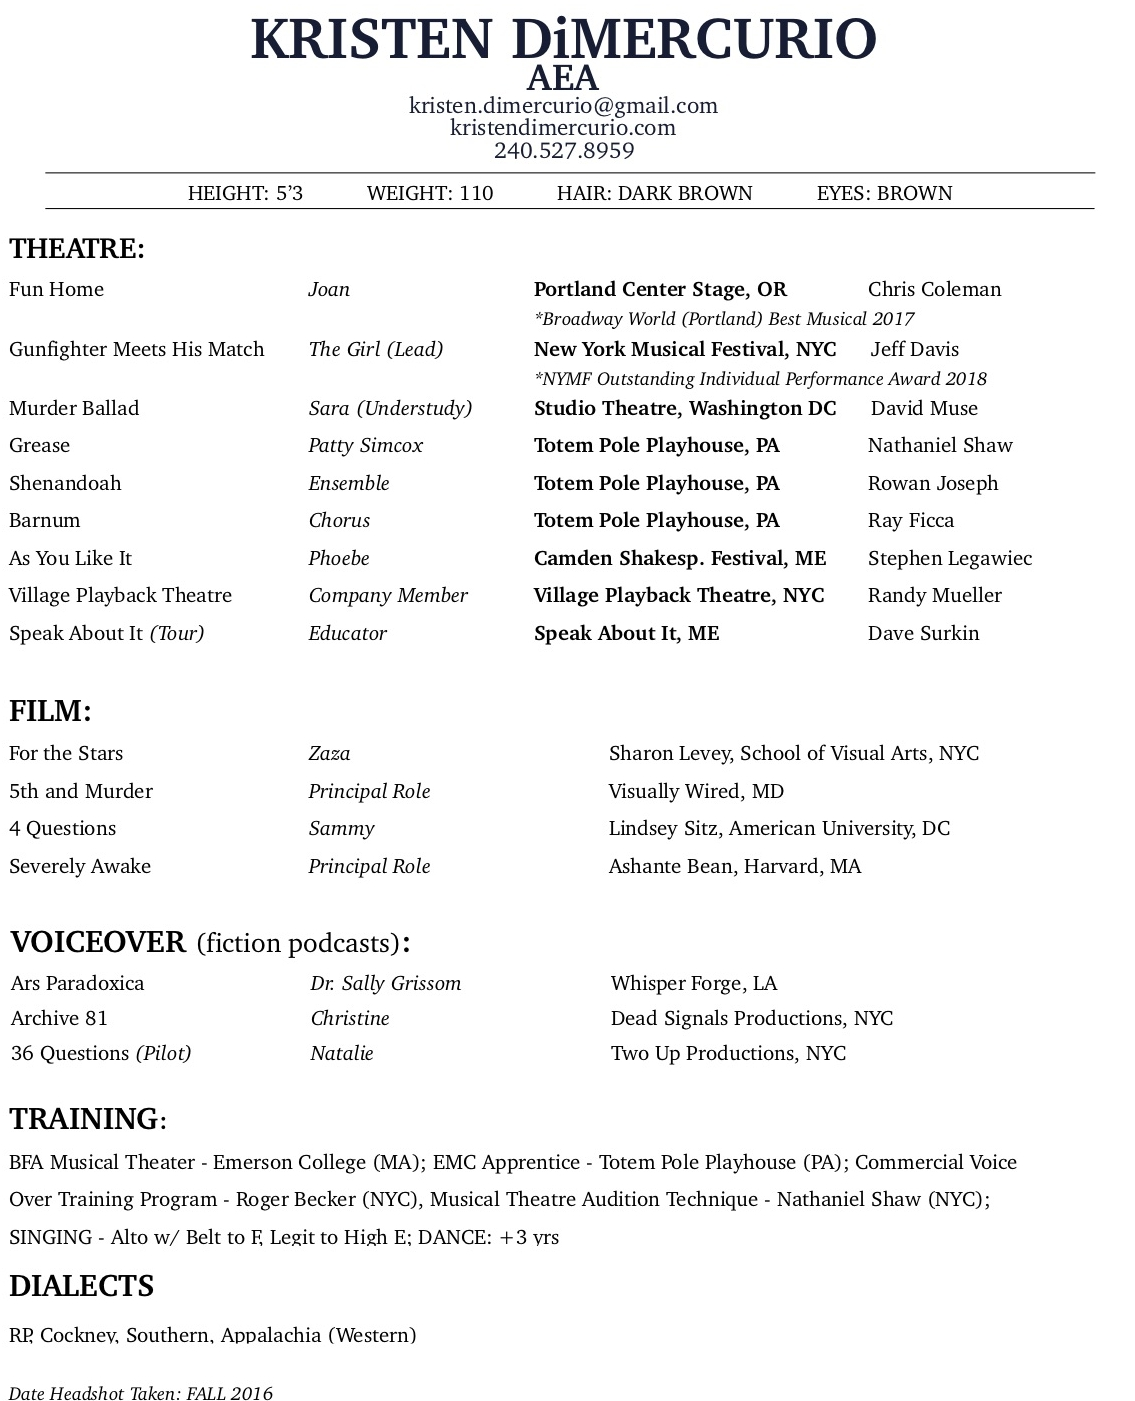 Kristen DiMercurio - Resume.jpg